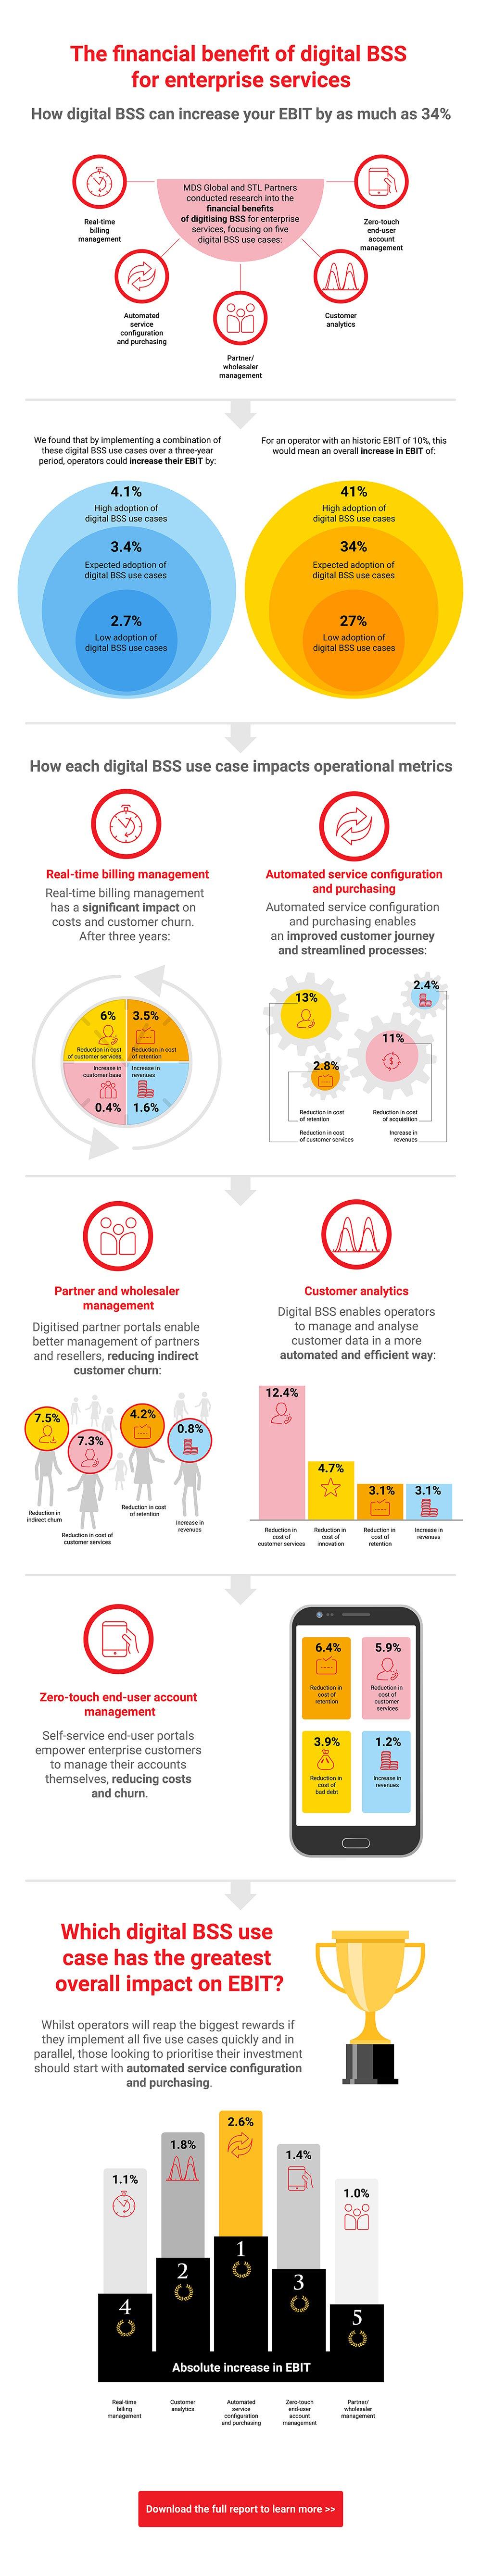 The impact of digital BSS on key financial metrics